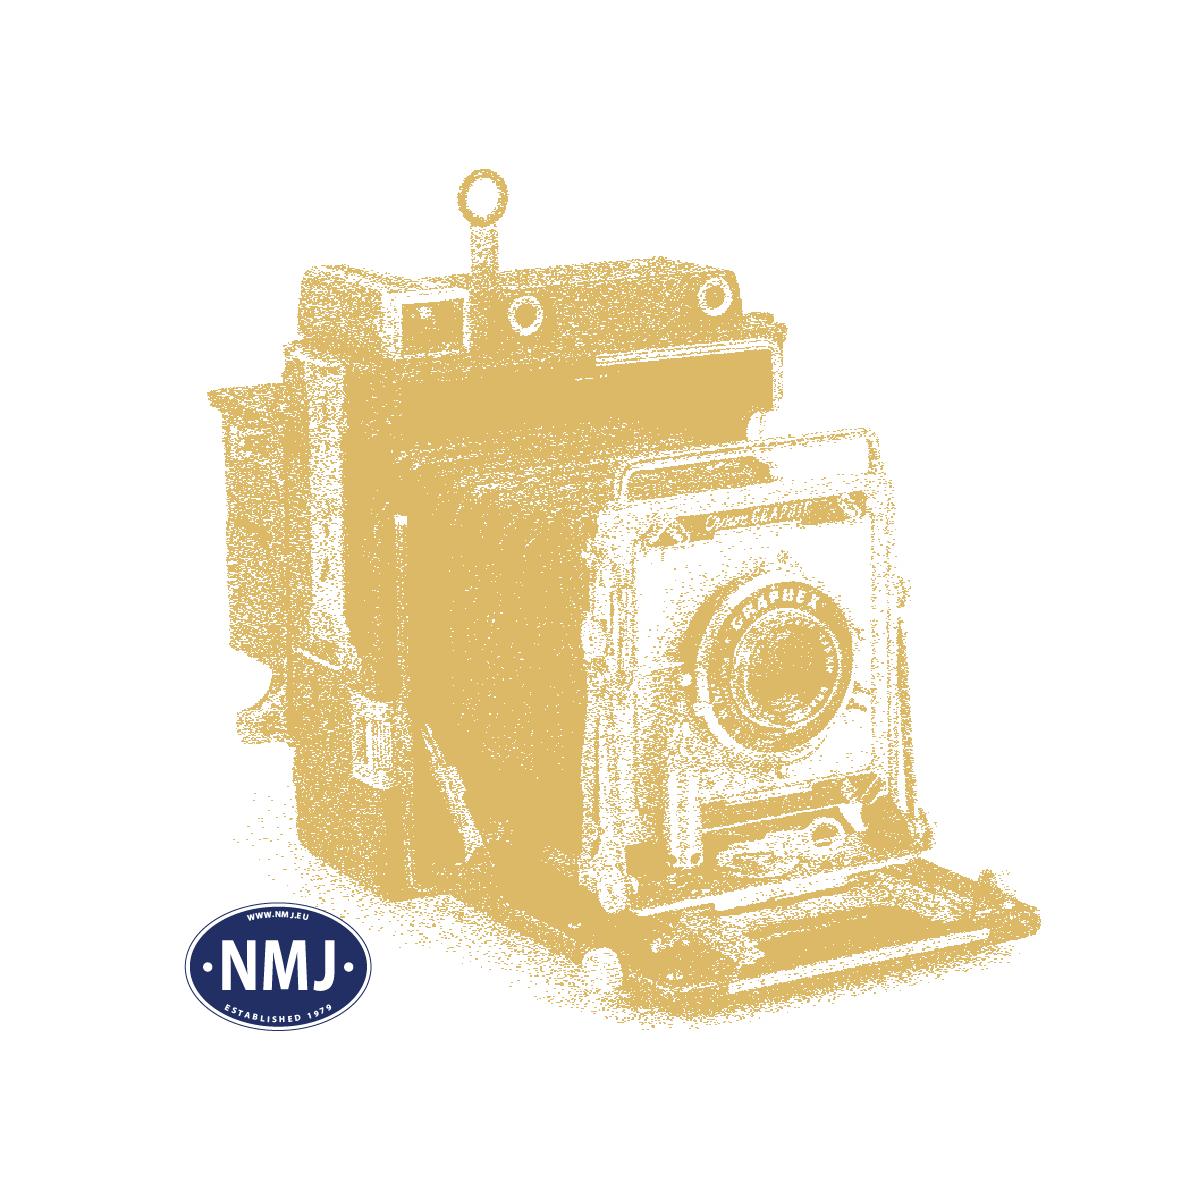 NMJS Elo 0298-0 - NMJ Superline NSB Elo 21 76 511 0298-0, m/ Bremseplattform